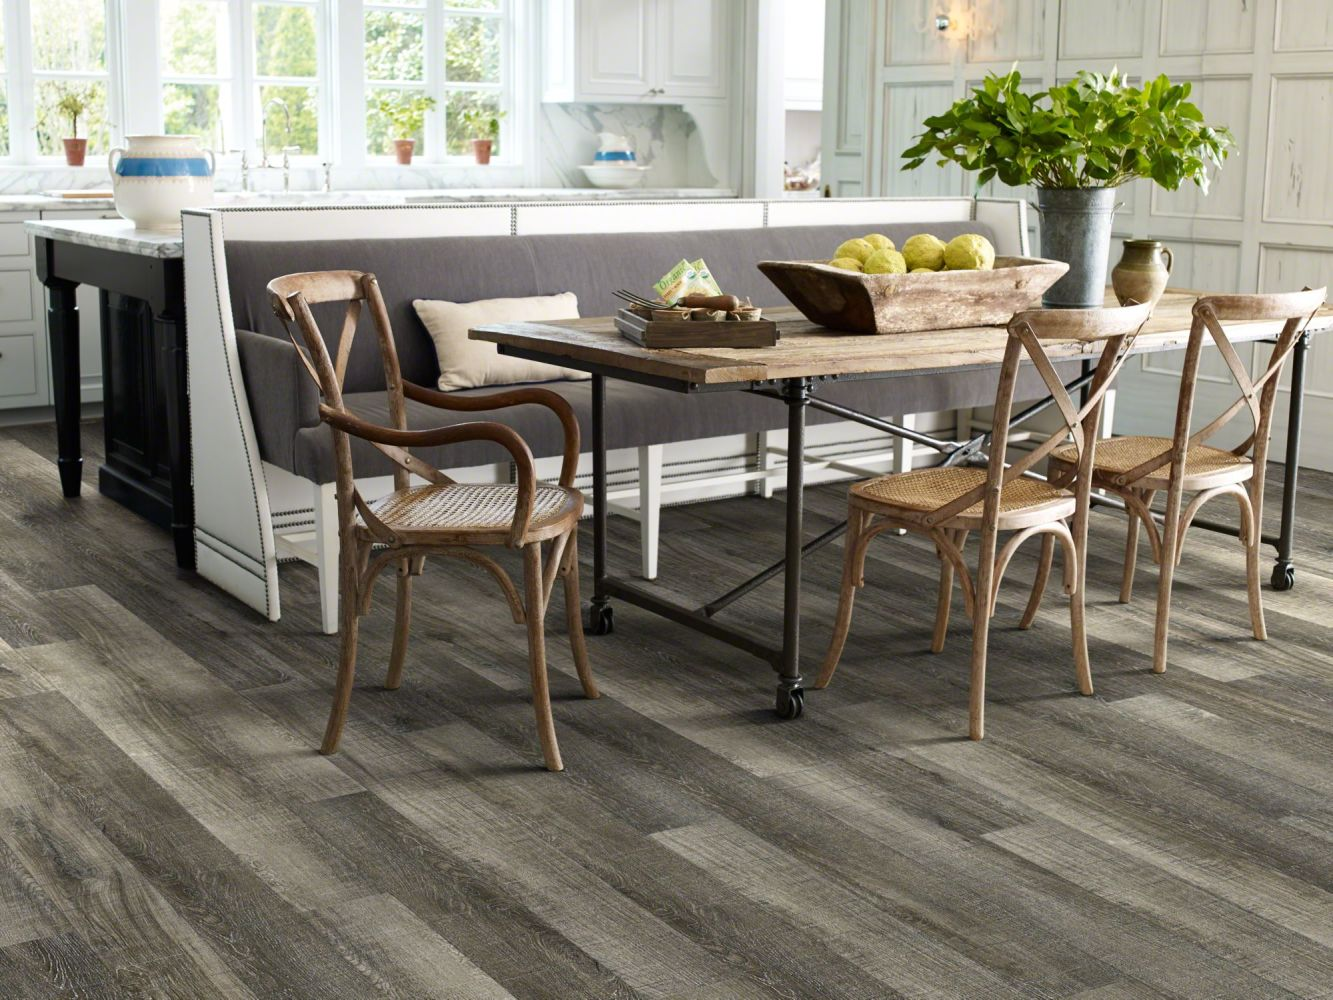 Shaw Floors Vinyl Residential Classico Plank Chiatta 00533_0426V